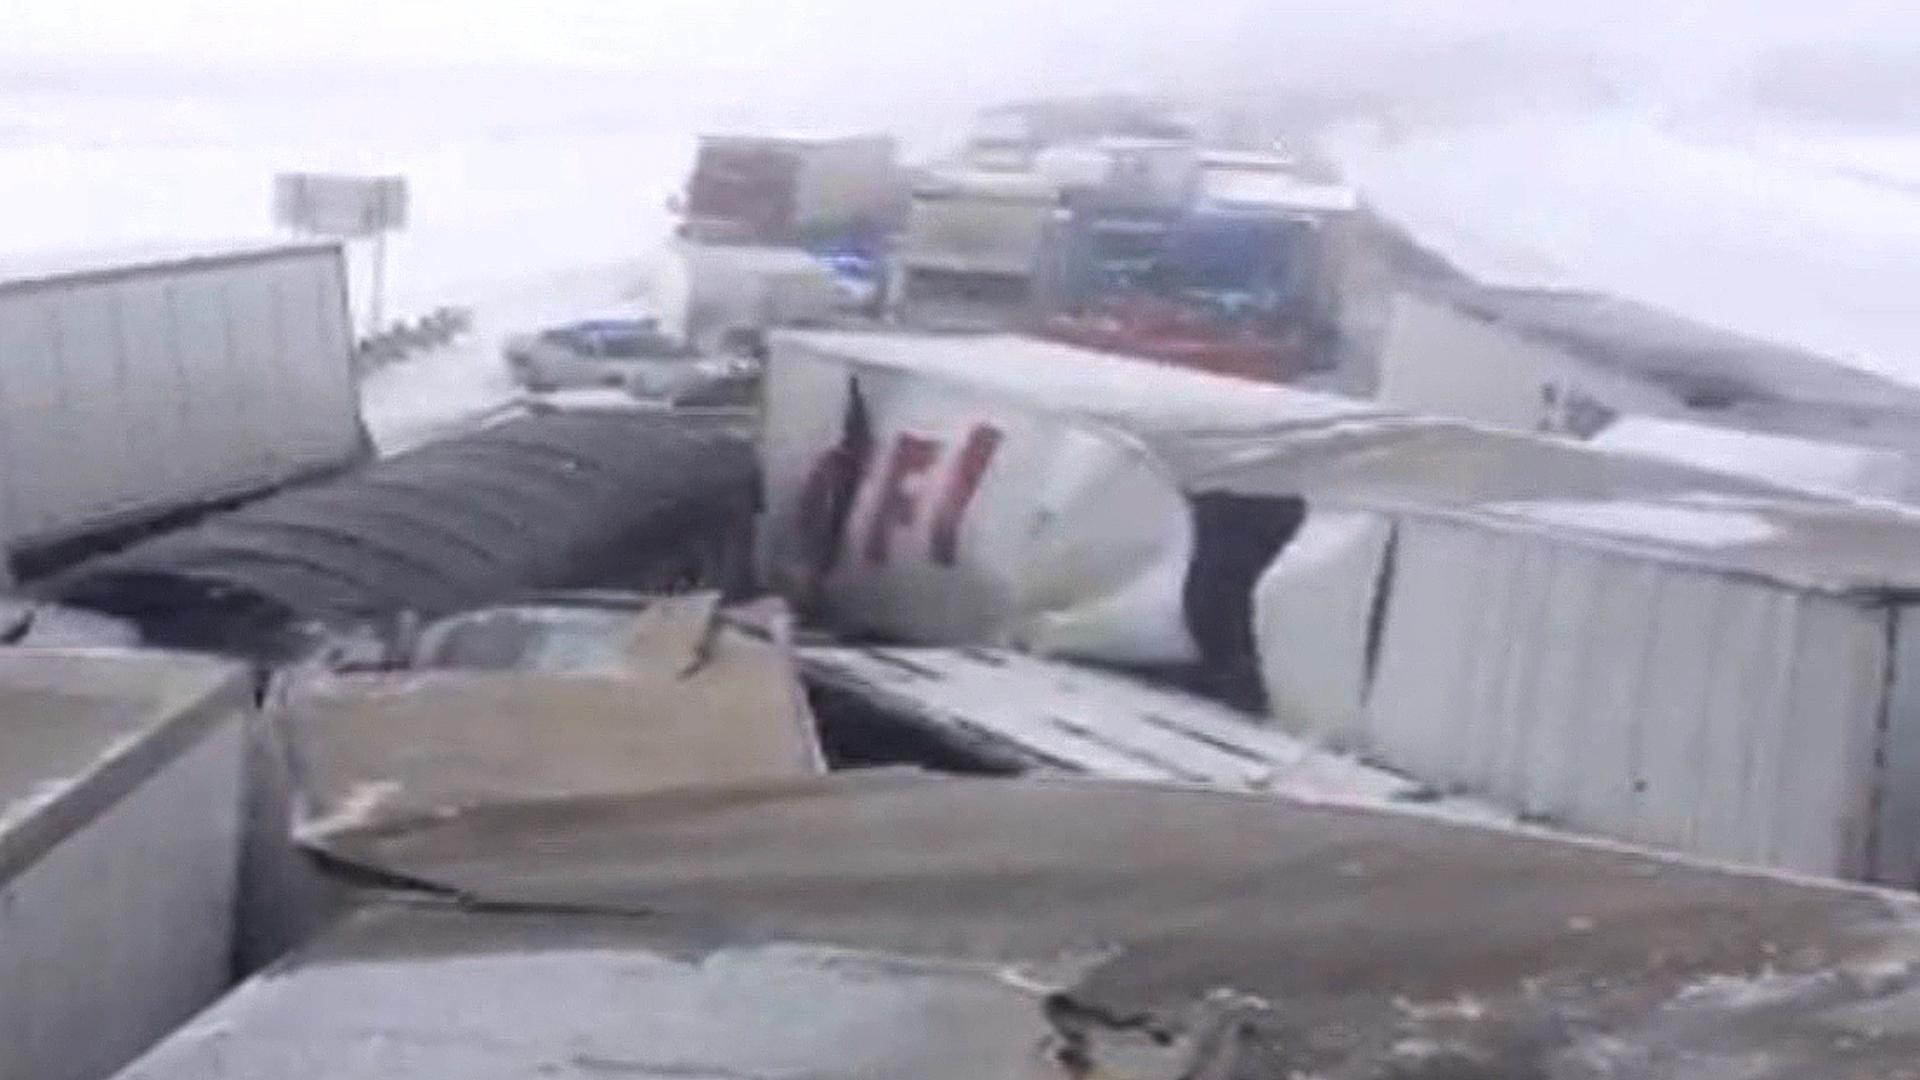 Snowy Ohio 50-Vehicle Pileup Kills 3, Badly Injures Trooper